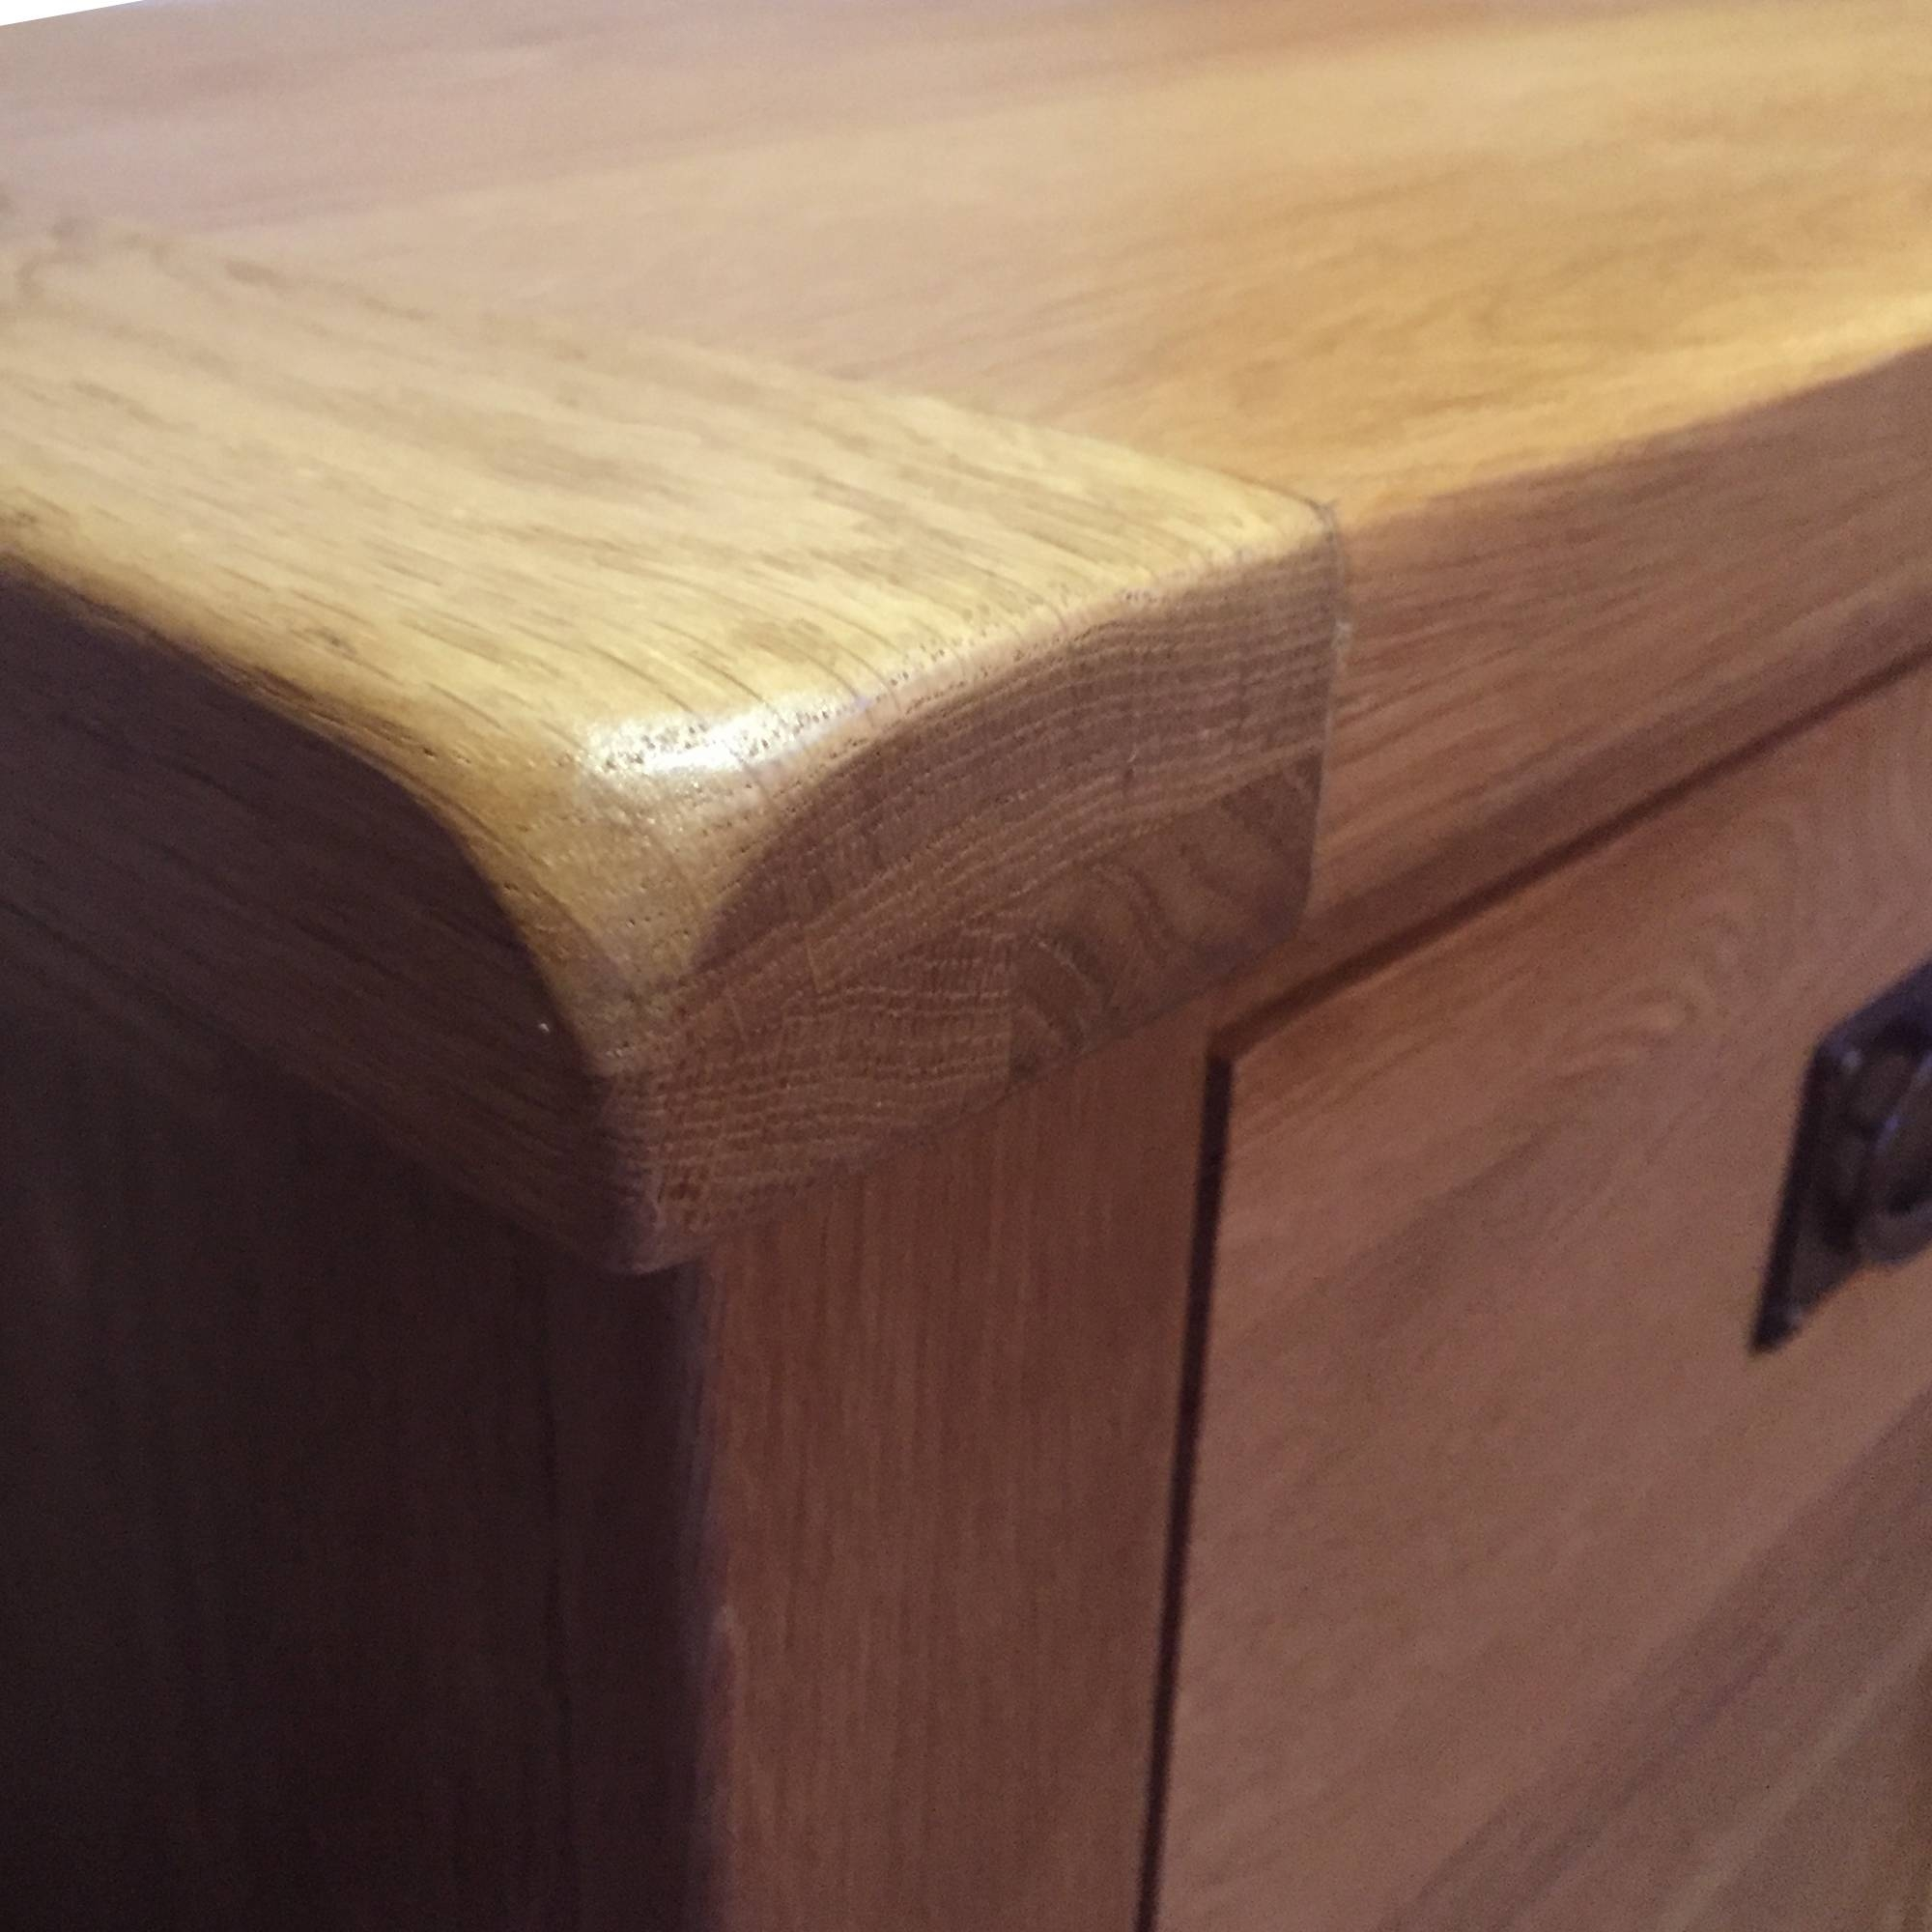 Cardington Extra Large Solid Oak Sideboard Within Latest Extra Large Oak Sideboards (View 10 of 15)